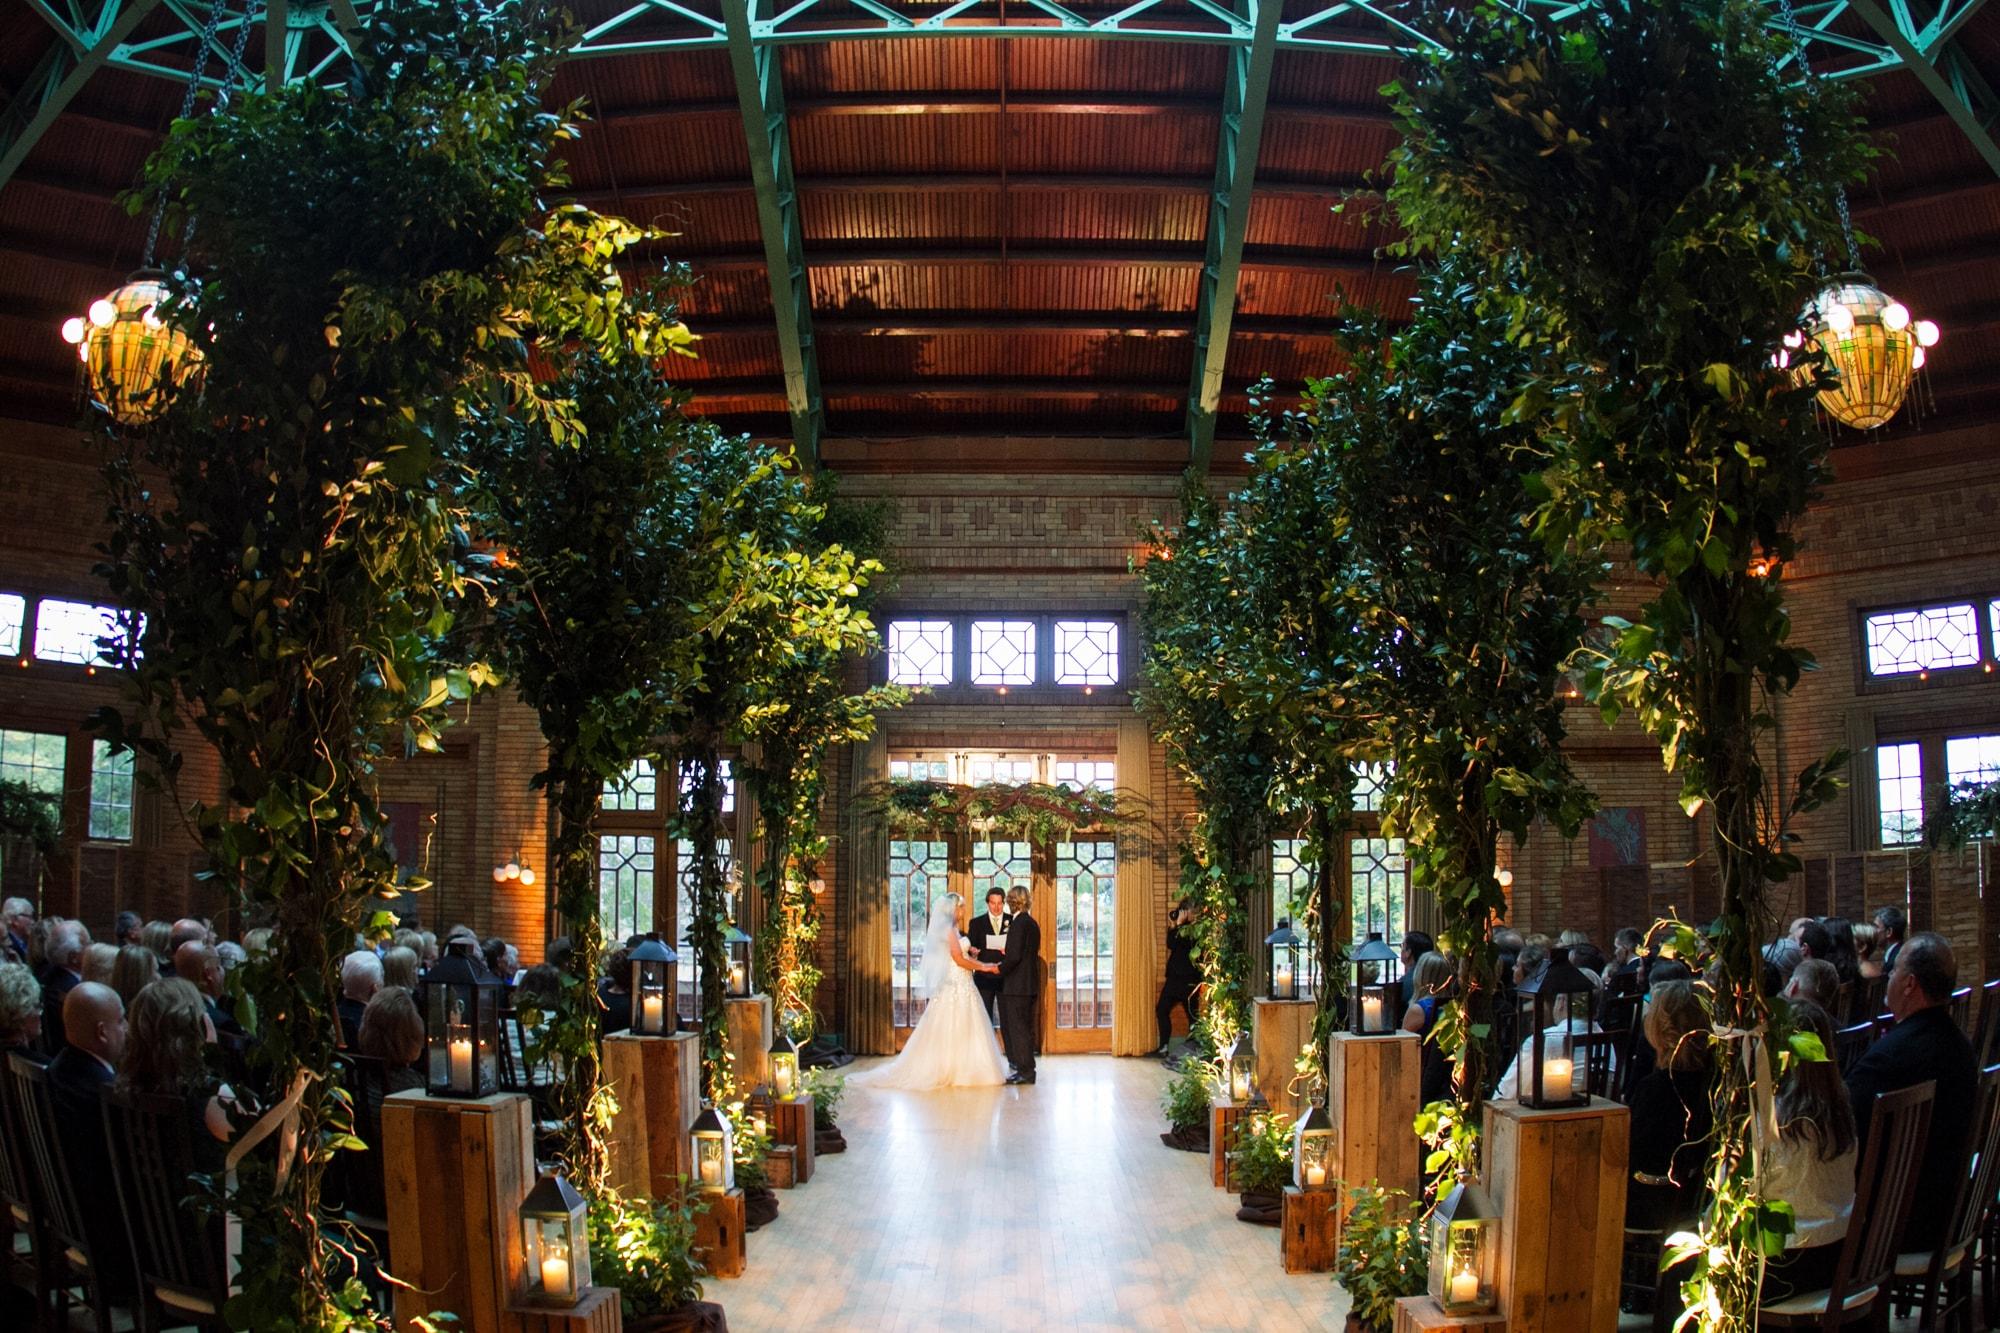 Cafe Brauer wedding ceremony with garden decor